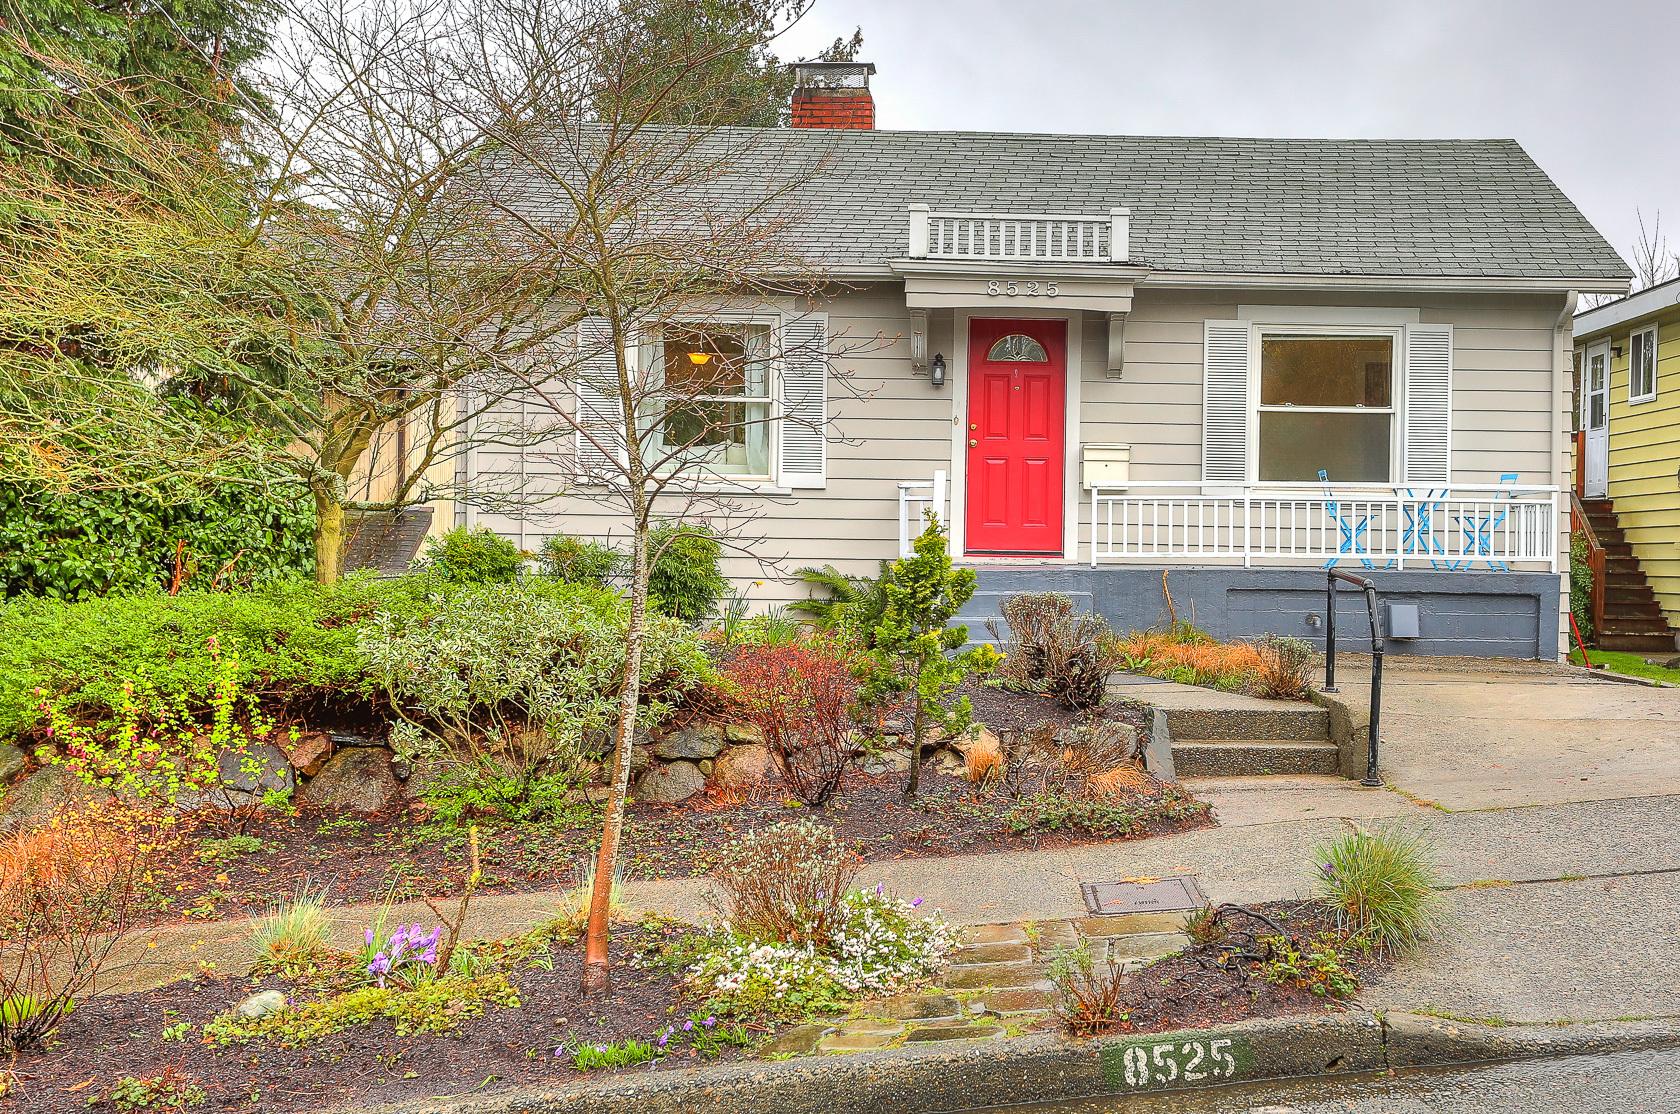 8525 Burke Ave N, Seattle, WA - USA (photo 1)